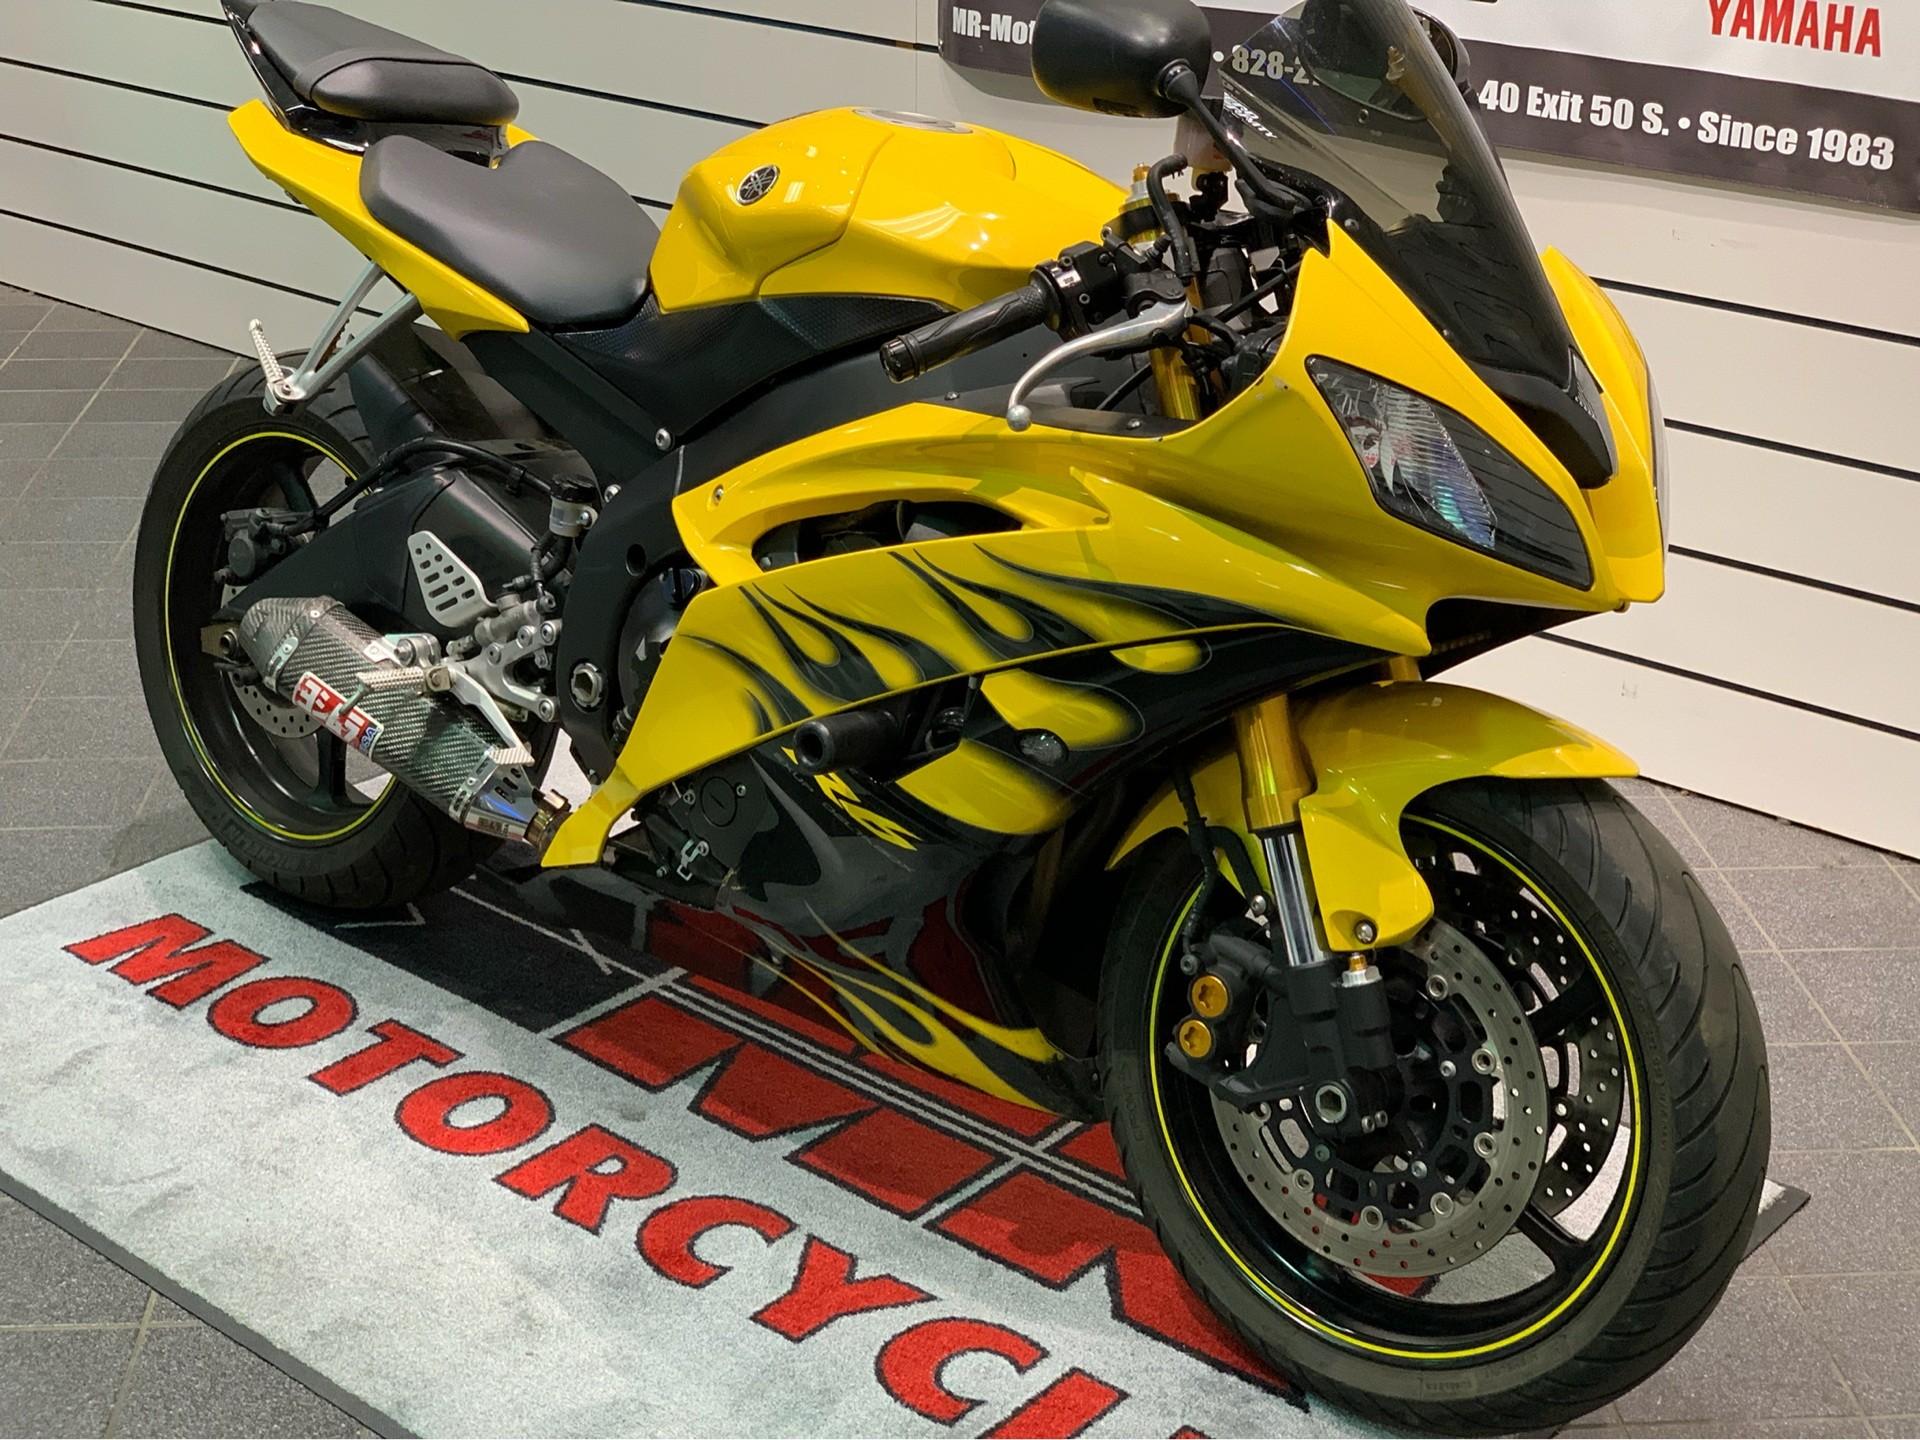 2008 Yamaha YZFR6 8